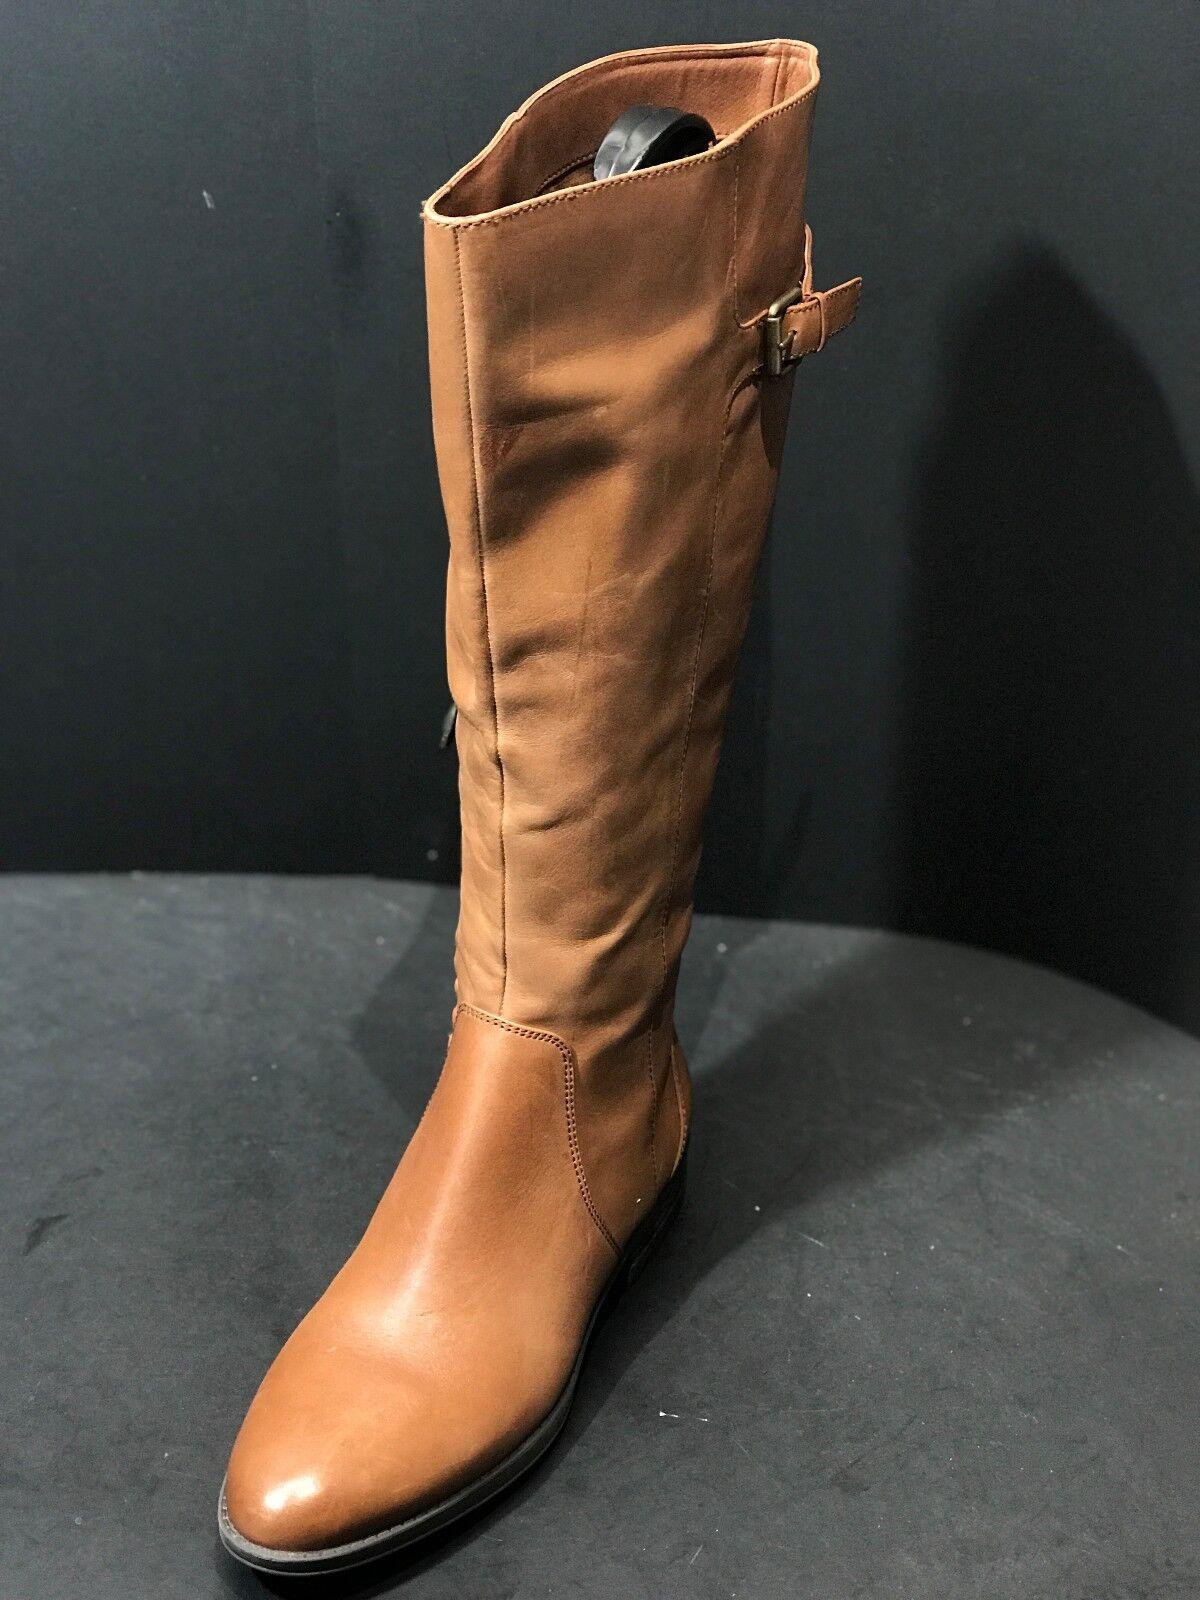 Sam Edelman Patton 2 Women's Whiskey Leather Knee High Riding Boots Size US 7 M